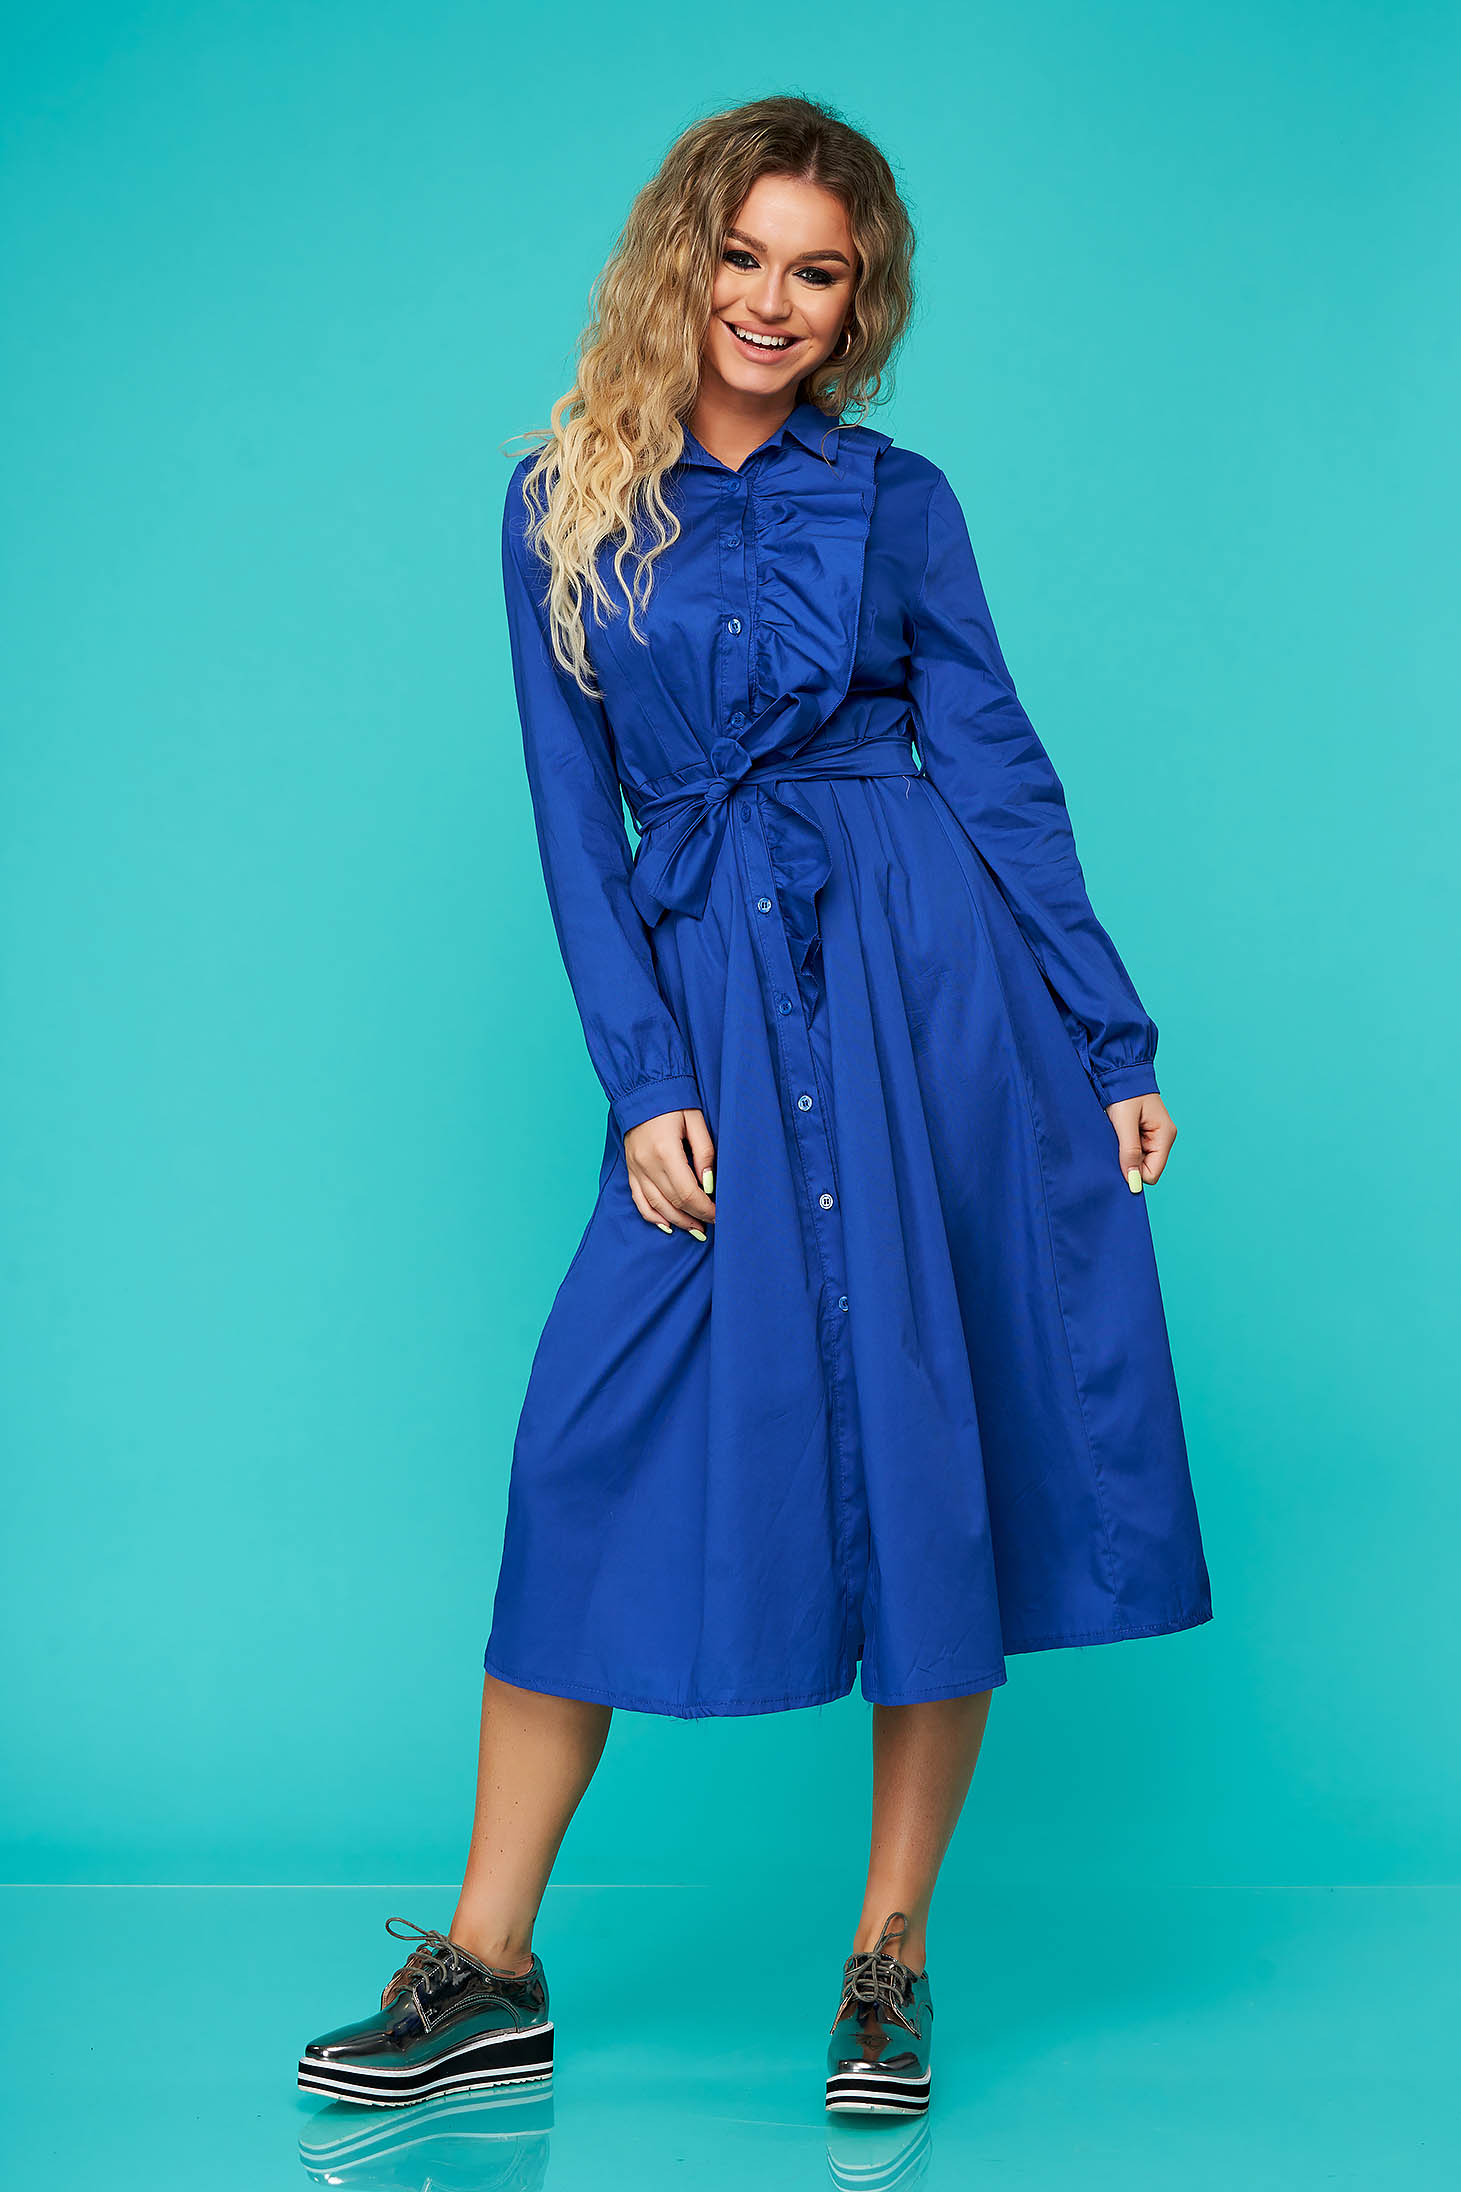 Rochie SunShine albastra de zi in clos cu volanase accesorizata cu cordon din bumbac neelastic